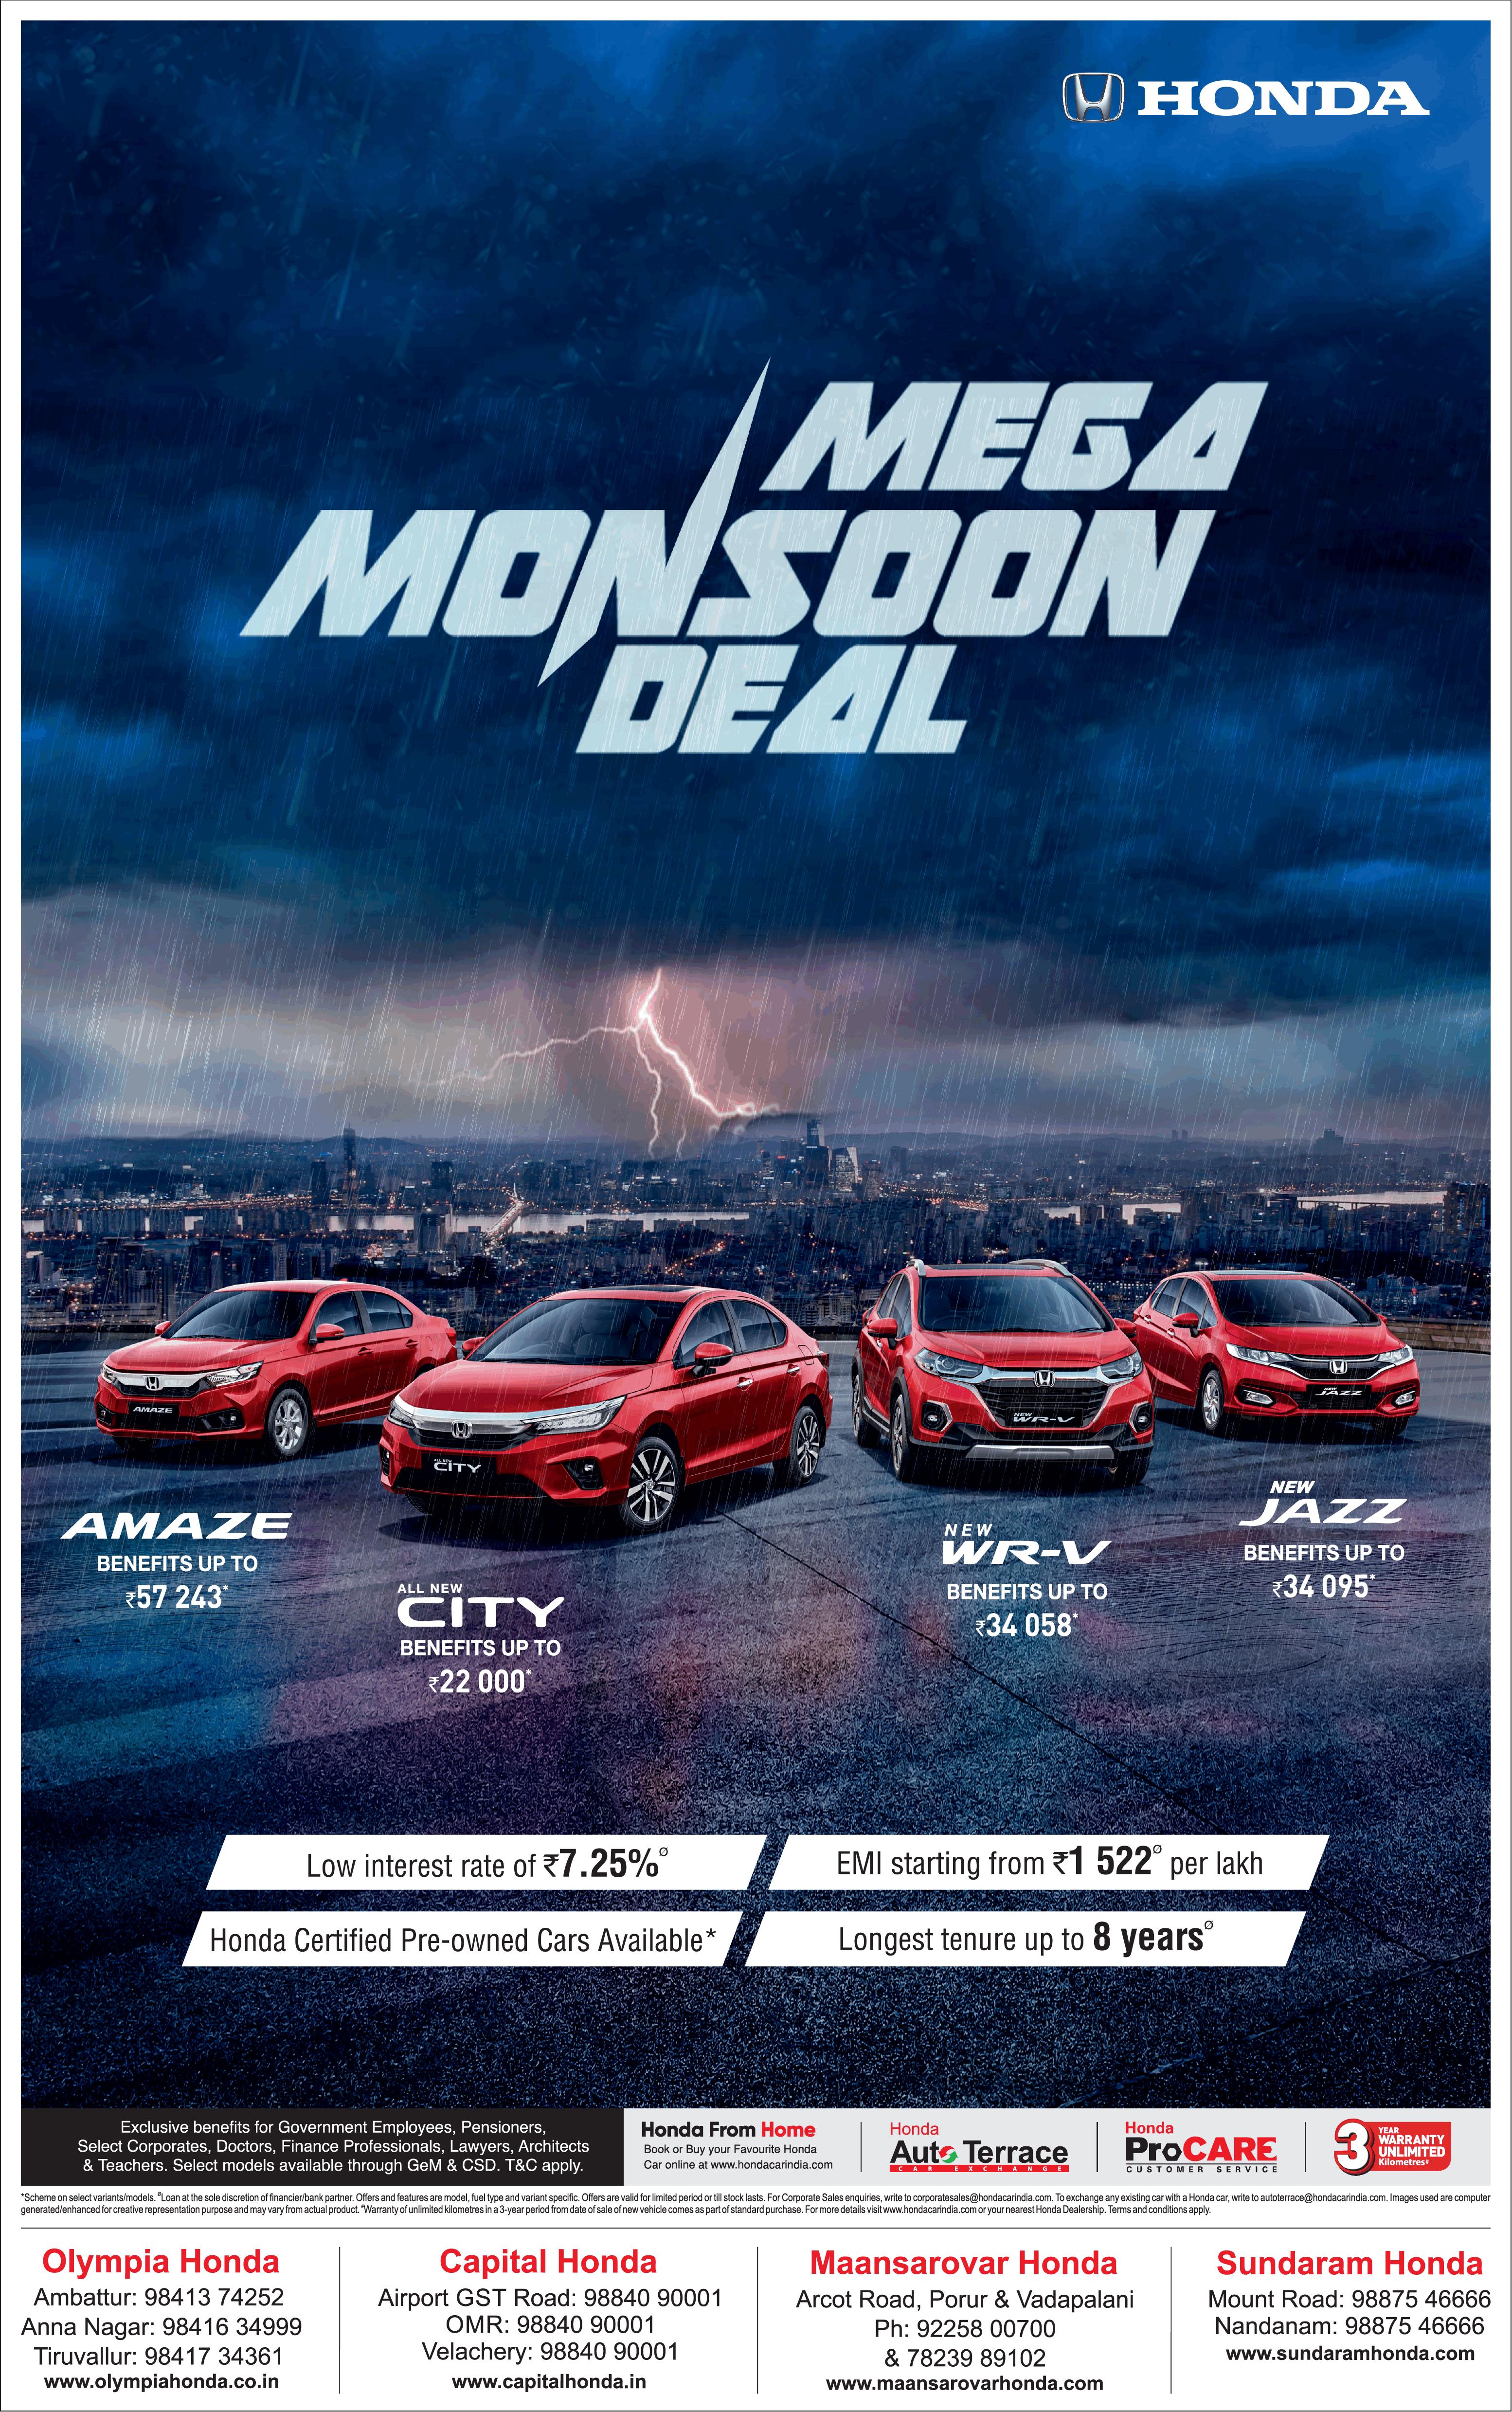 honda-mega-monsoon-deal-on-all-honda-cars-ad-times-of-india-chennai-9-7-2021